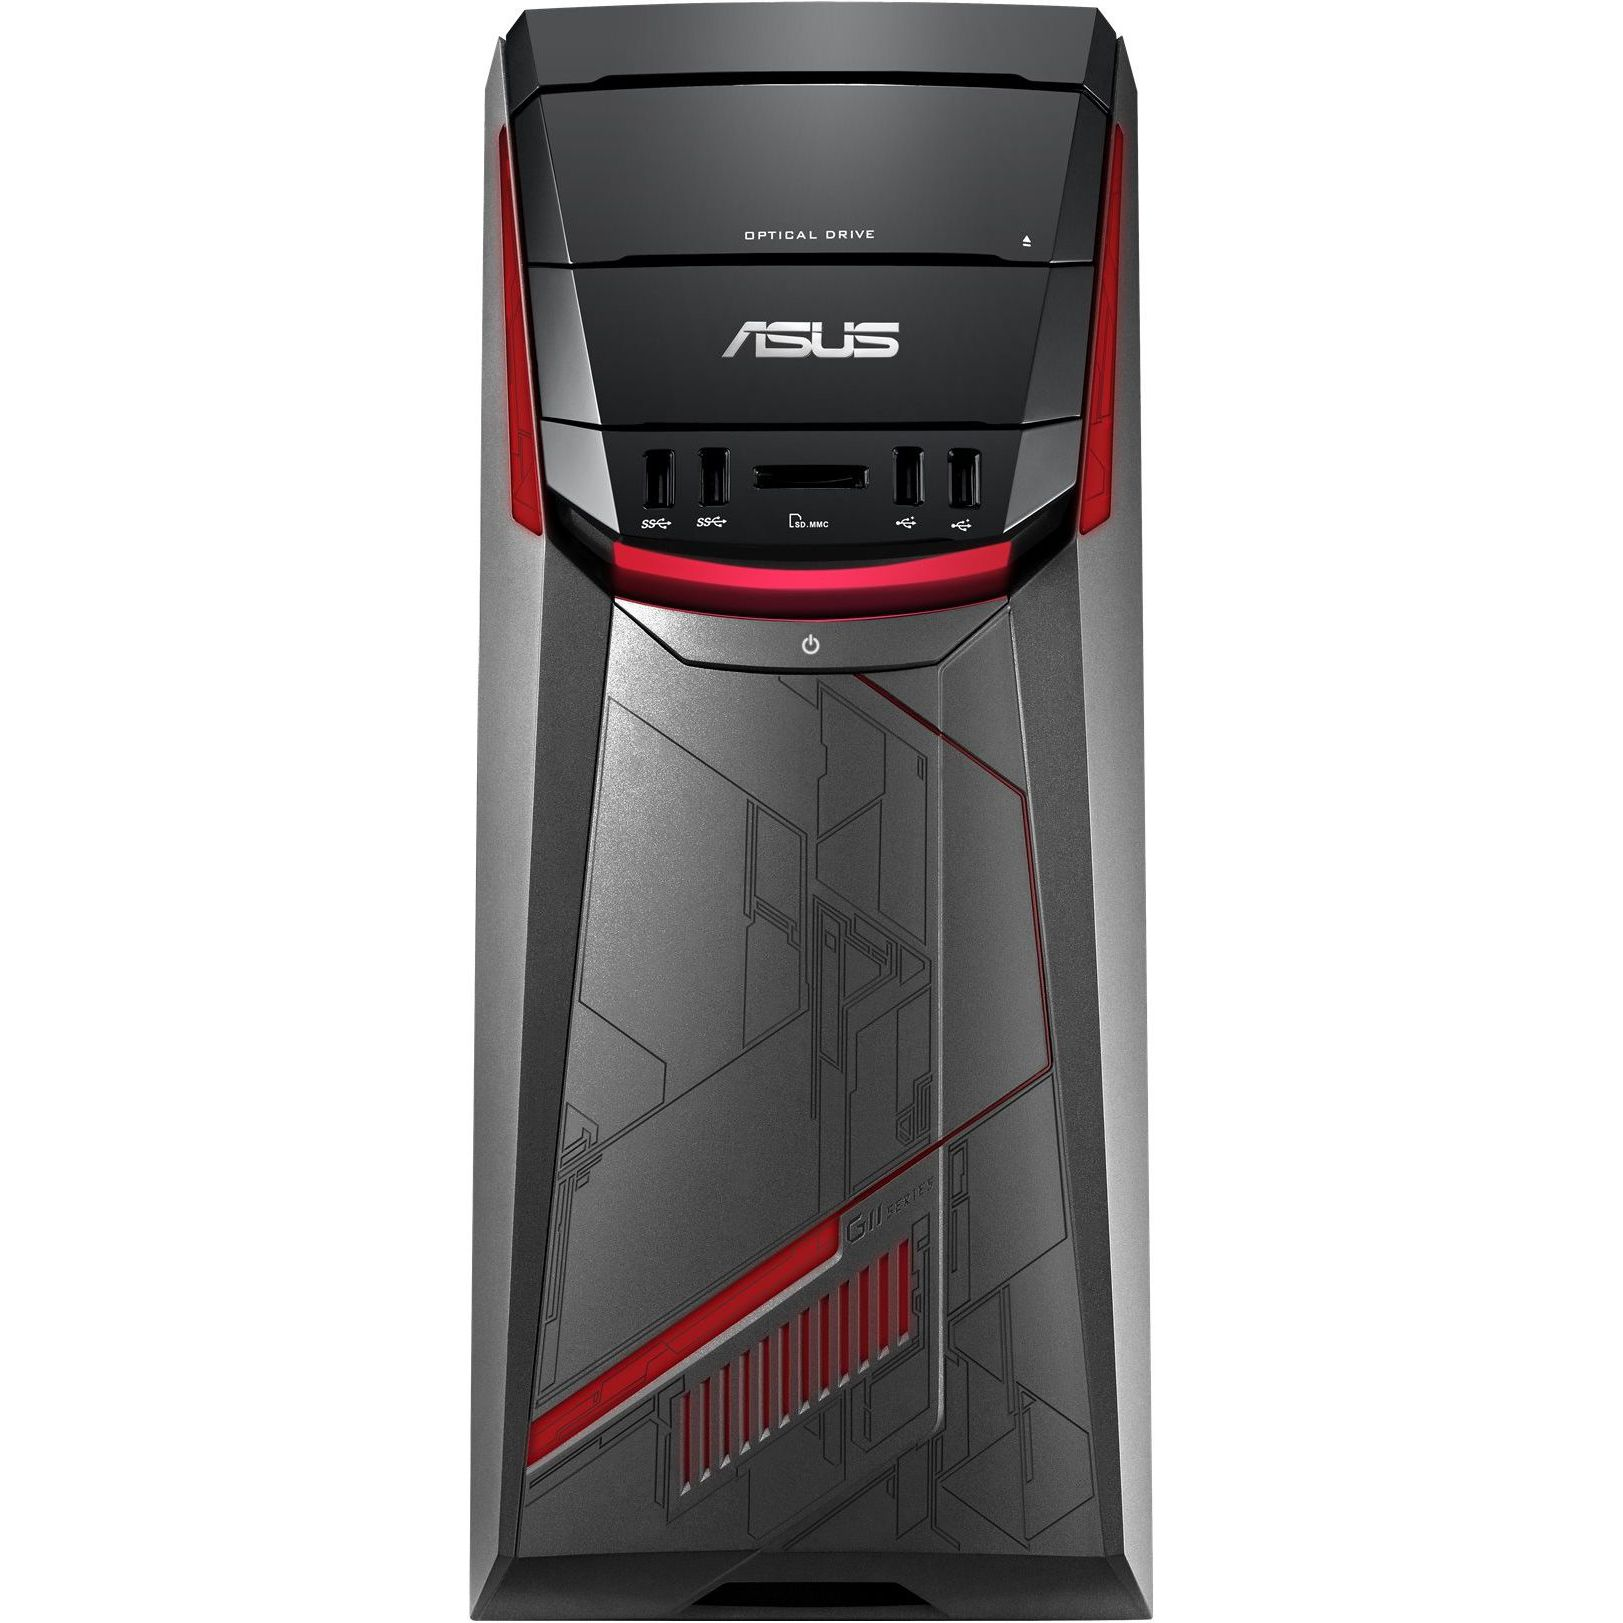 Sistem Brand Asus G11CD Intel Core i5-7400 GTX 1050-2GB RAM 8GB HDD 1TB Endless OS